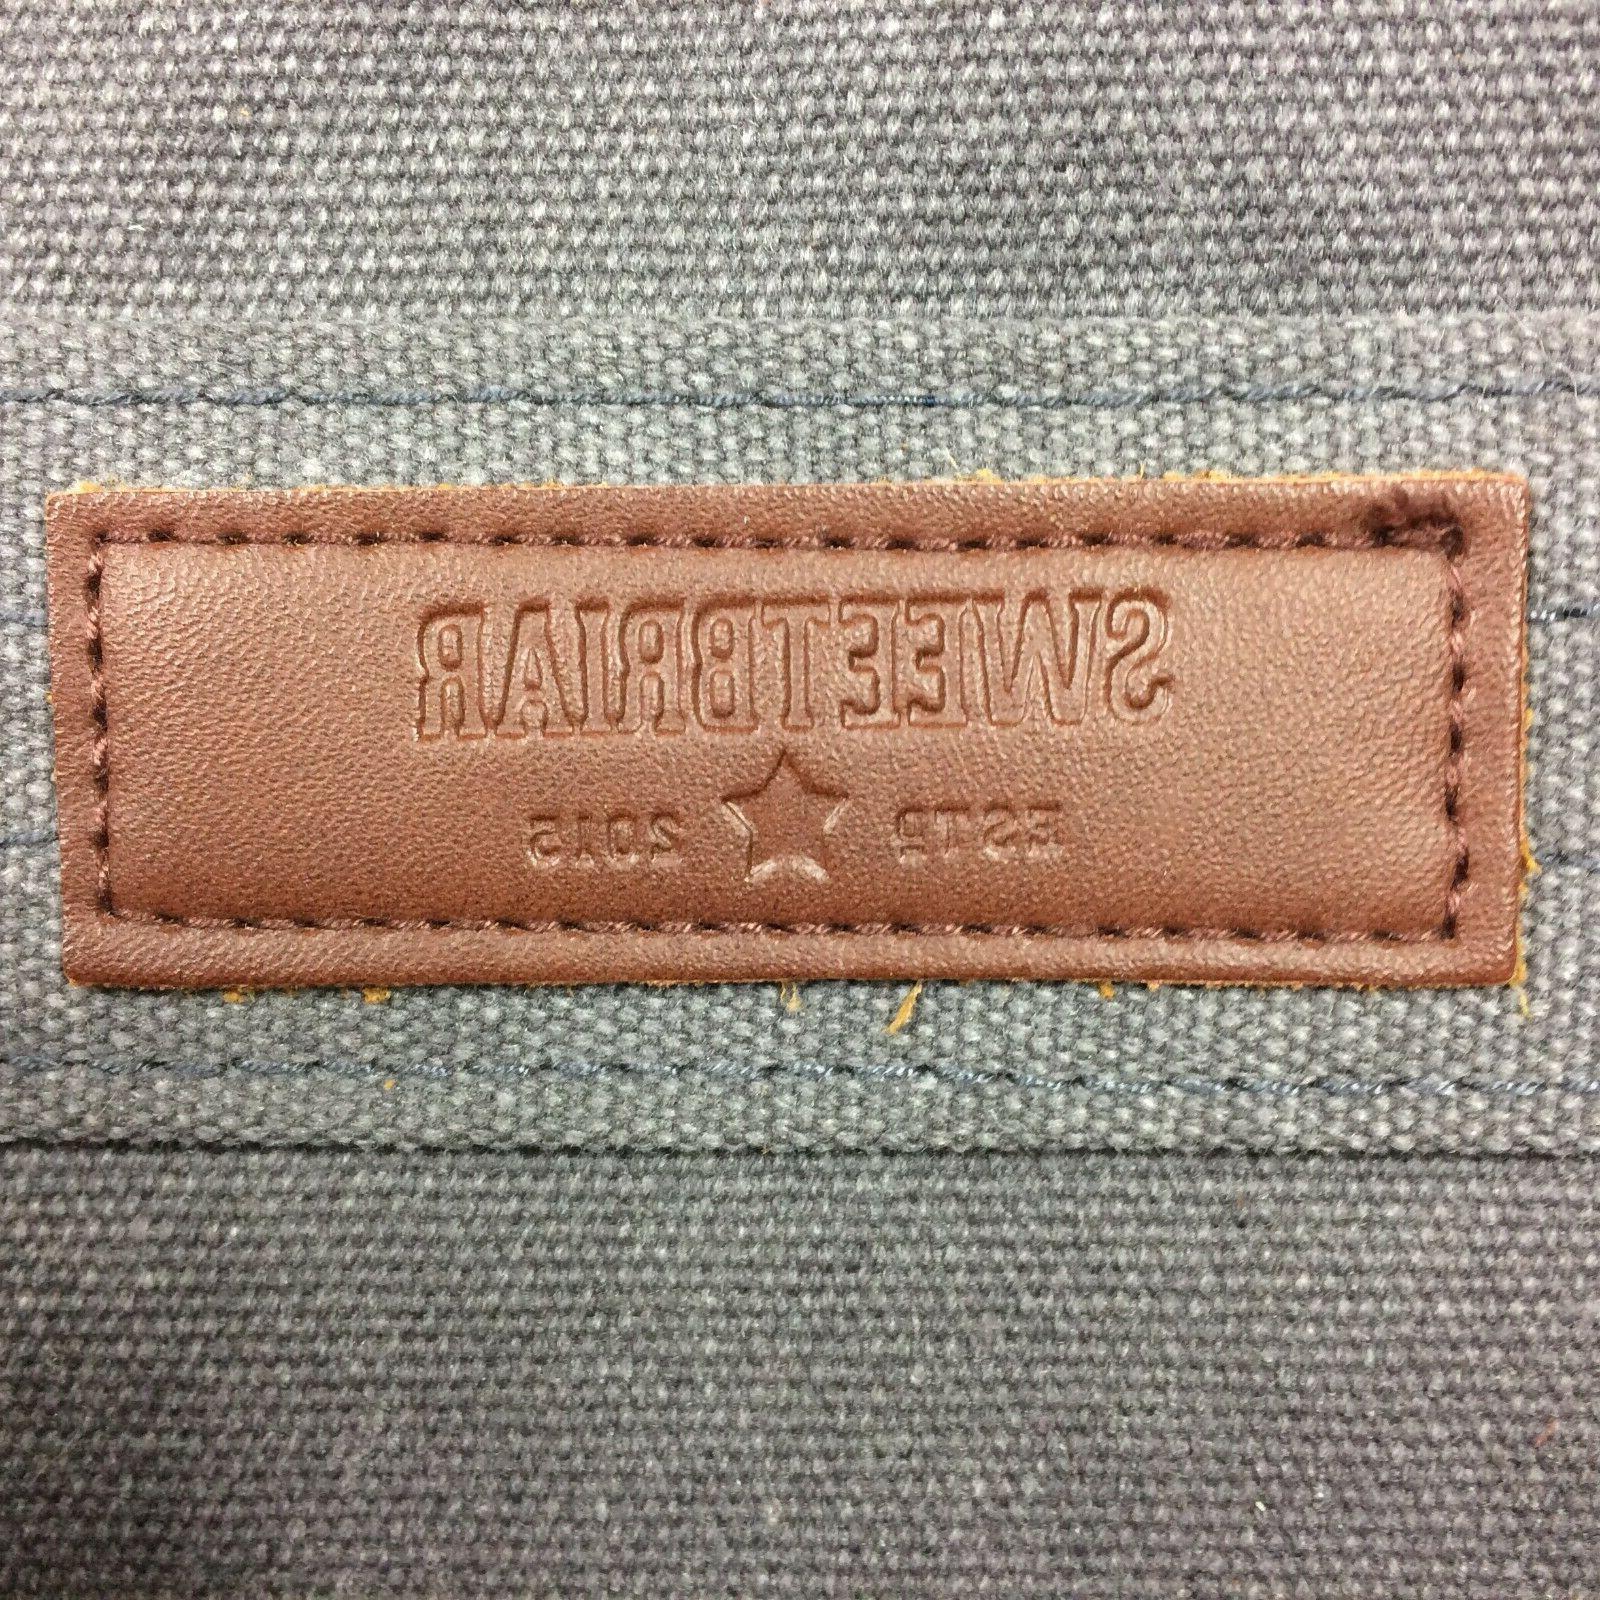 Sweetbriar Laptop Leather